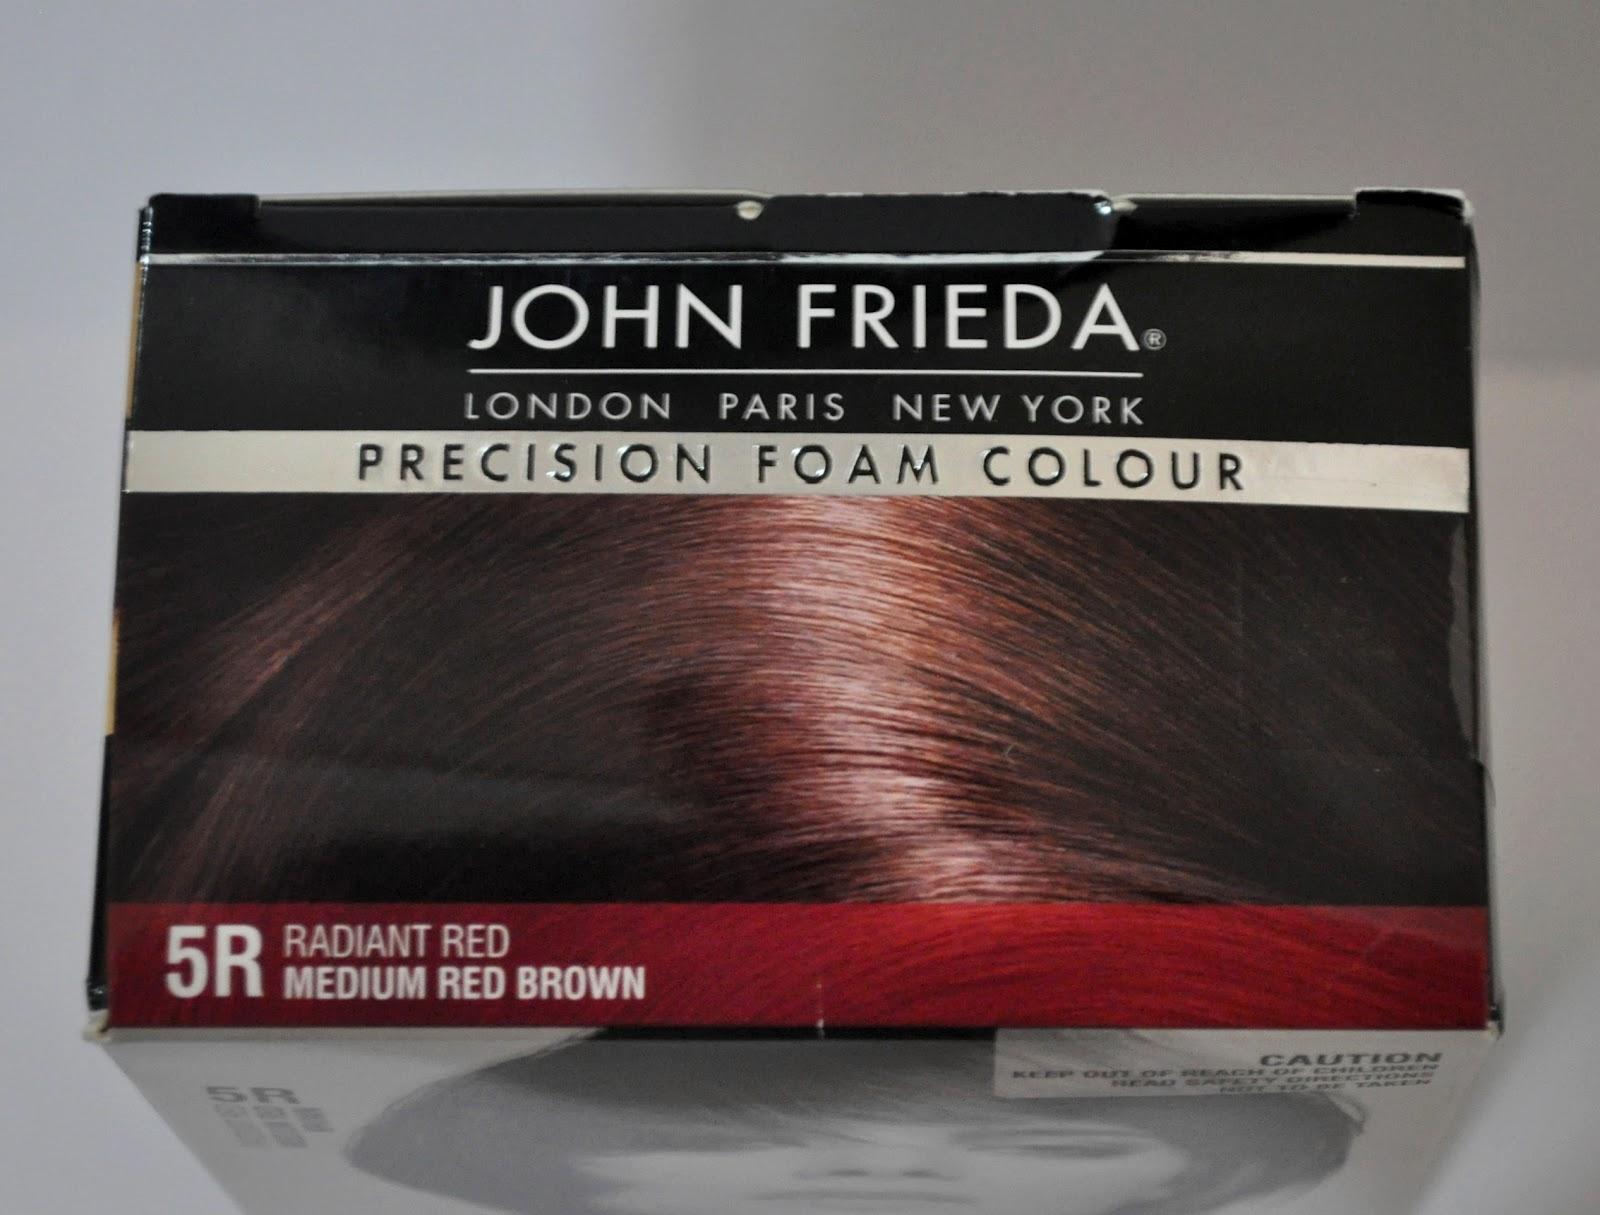 DIY Hair Colour With John Freida Precision Foam Colour